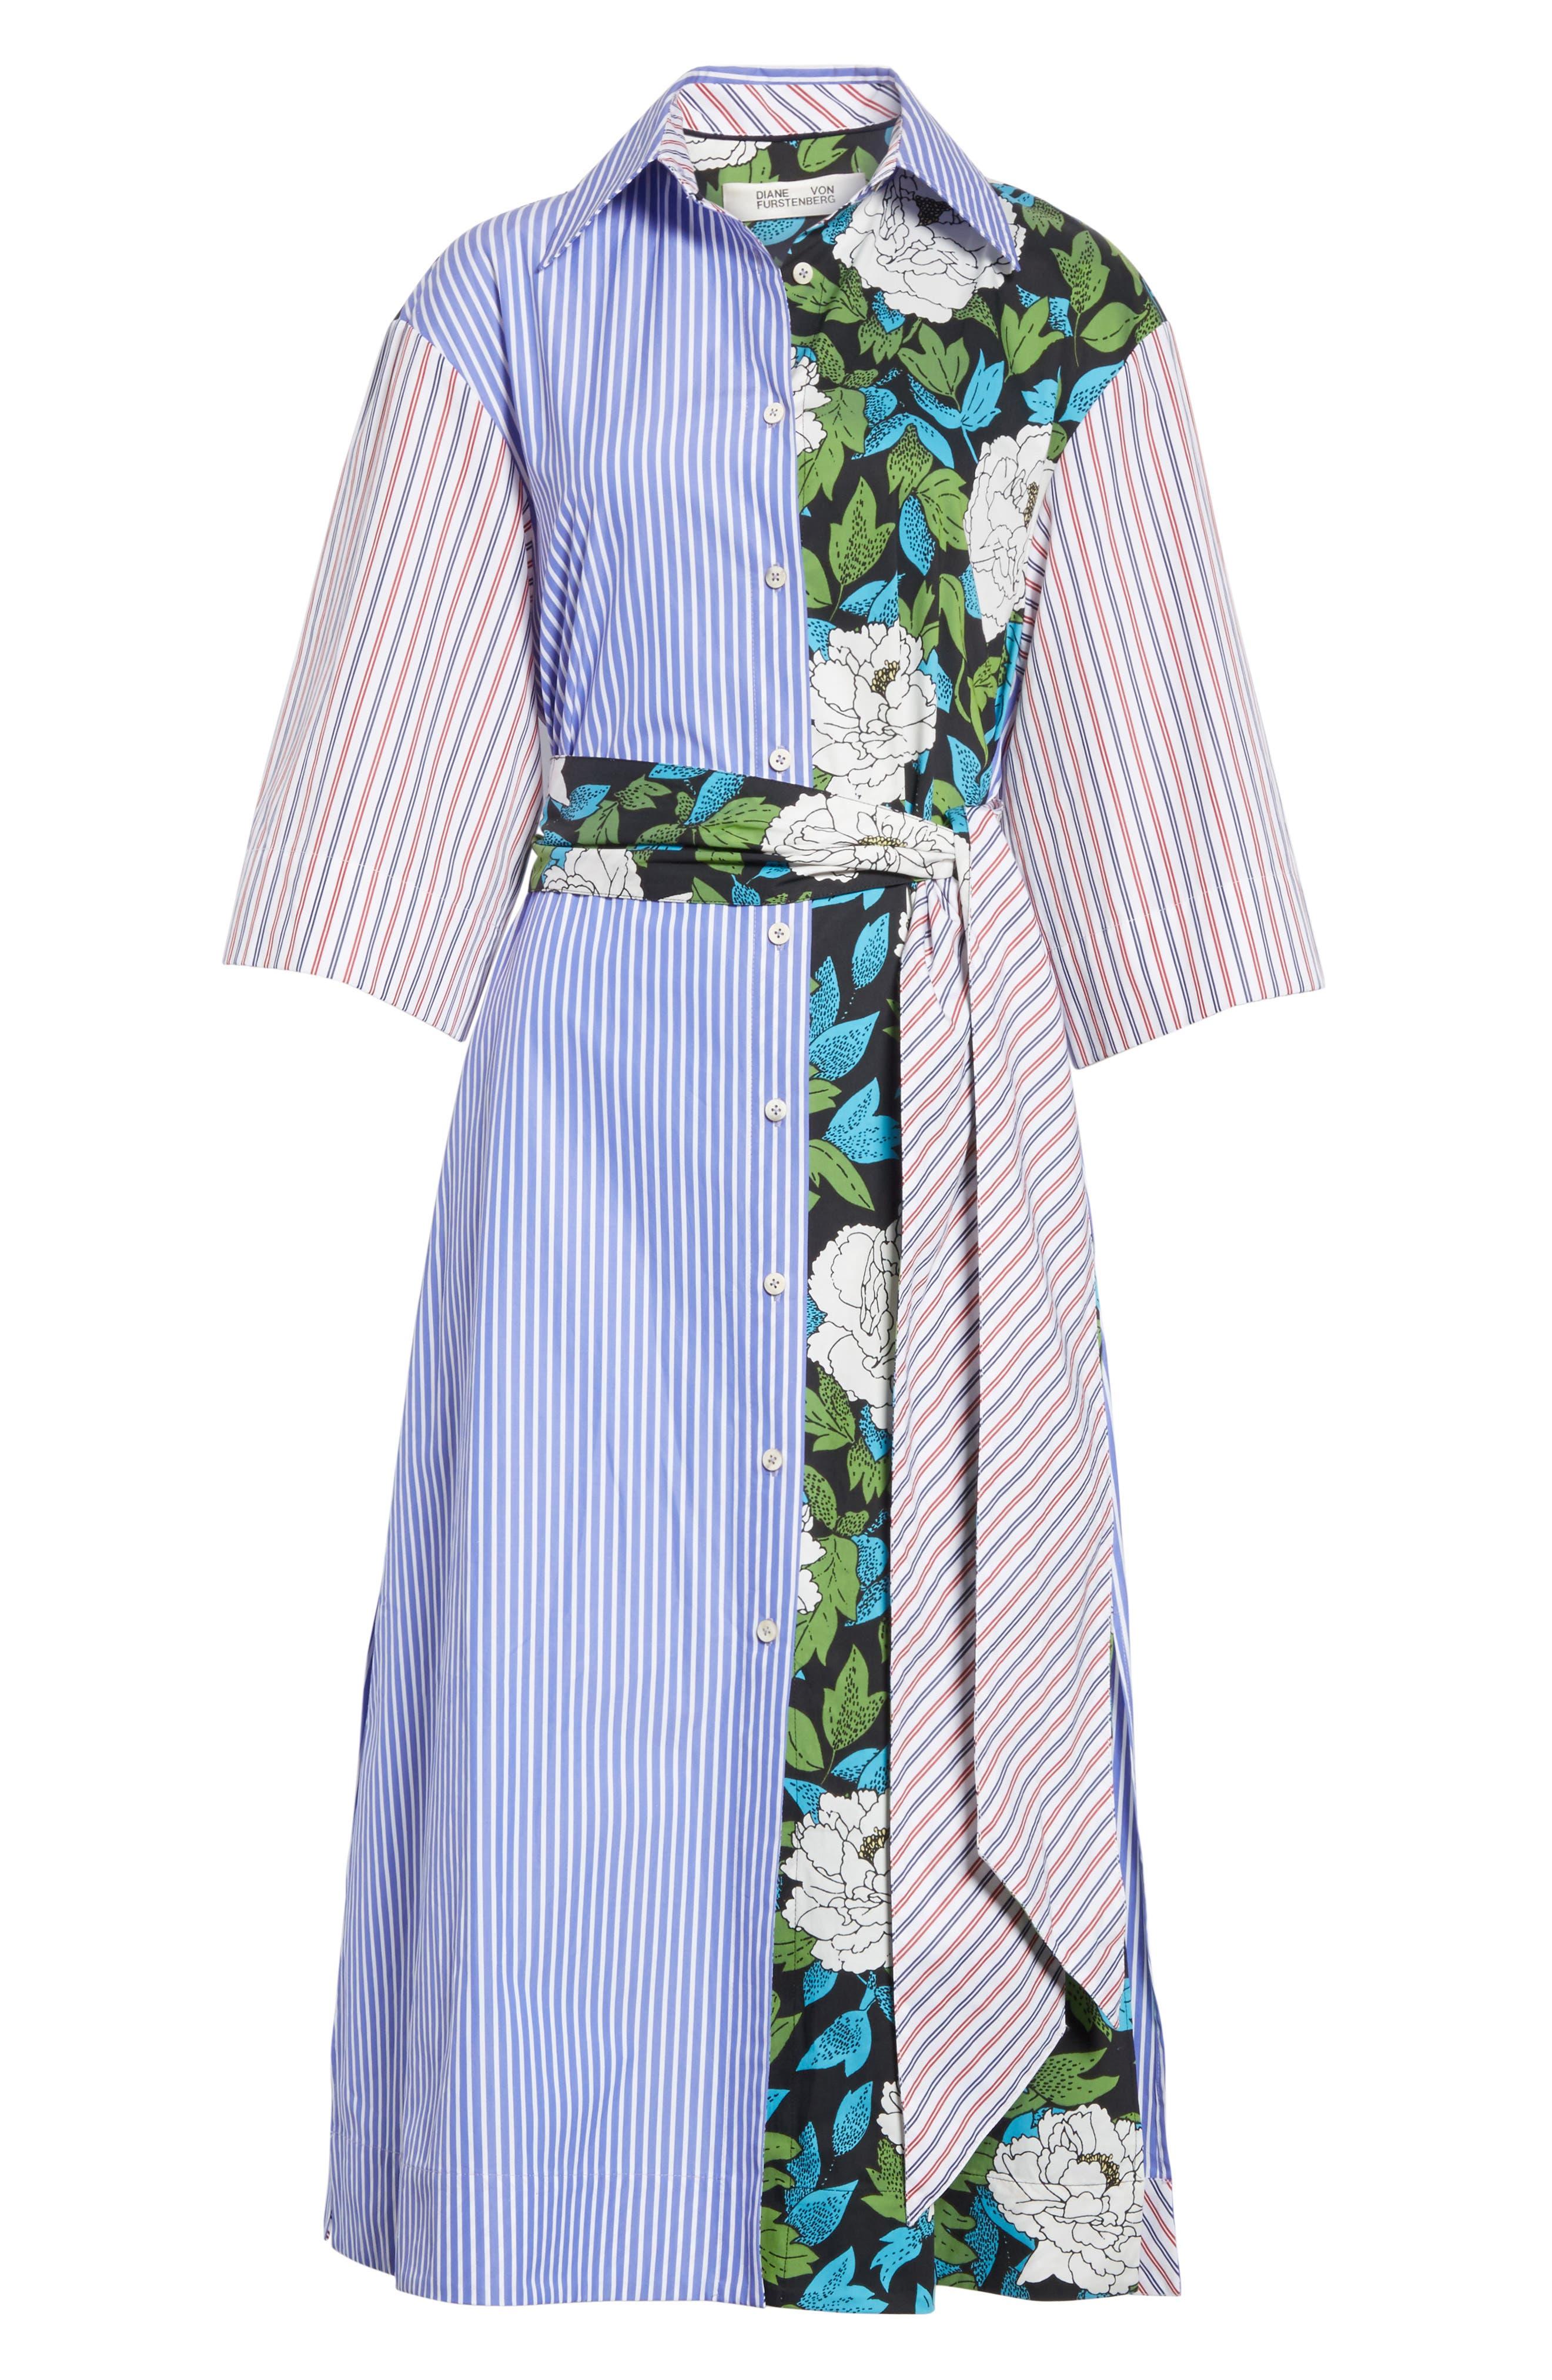 Diane von Furstenberg Mixed Print Cotton Shirtdress,                             Alternate thumbnail 6, color,                             Blue White Wide Stripe